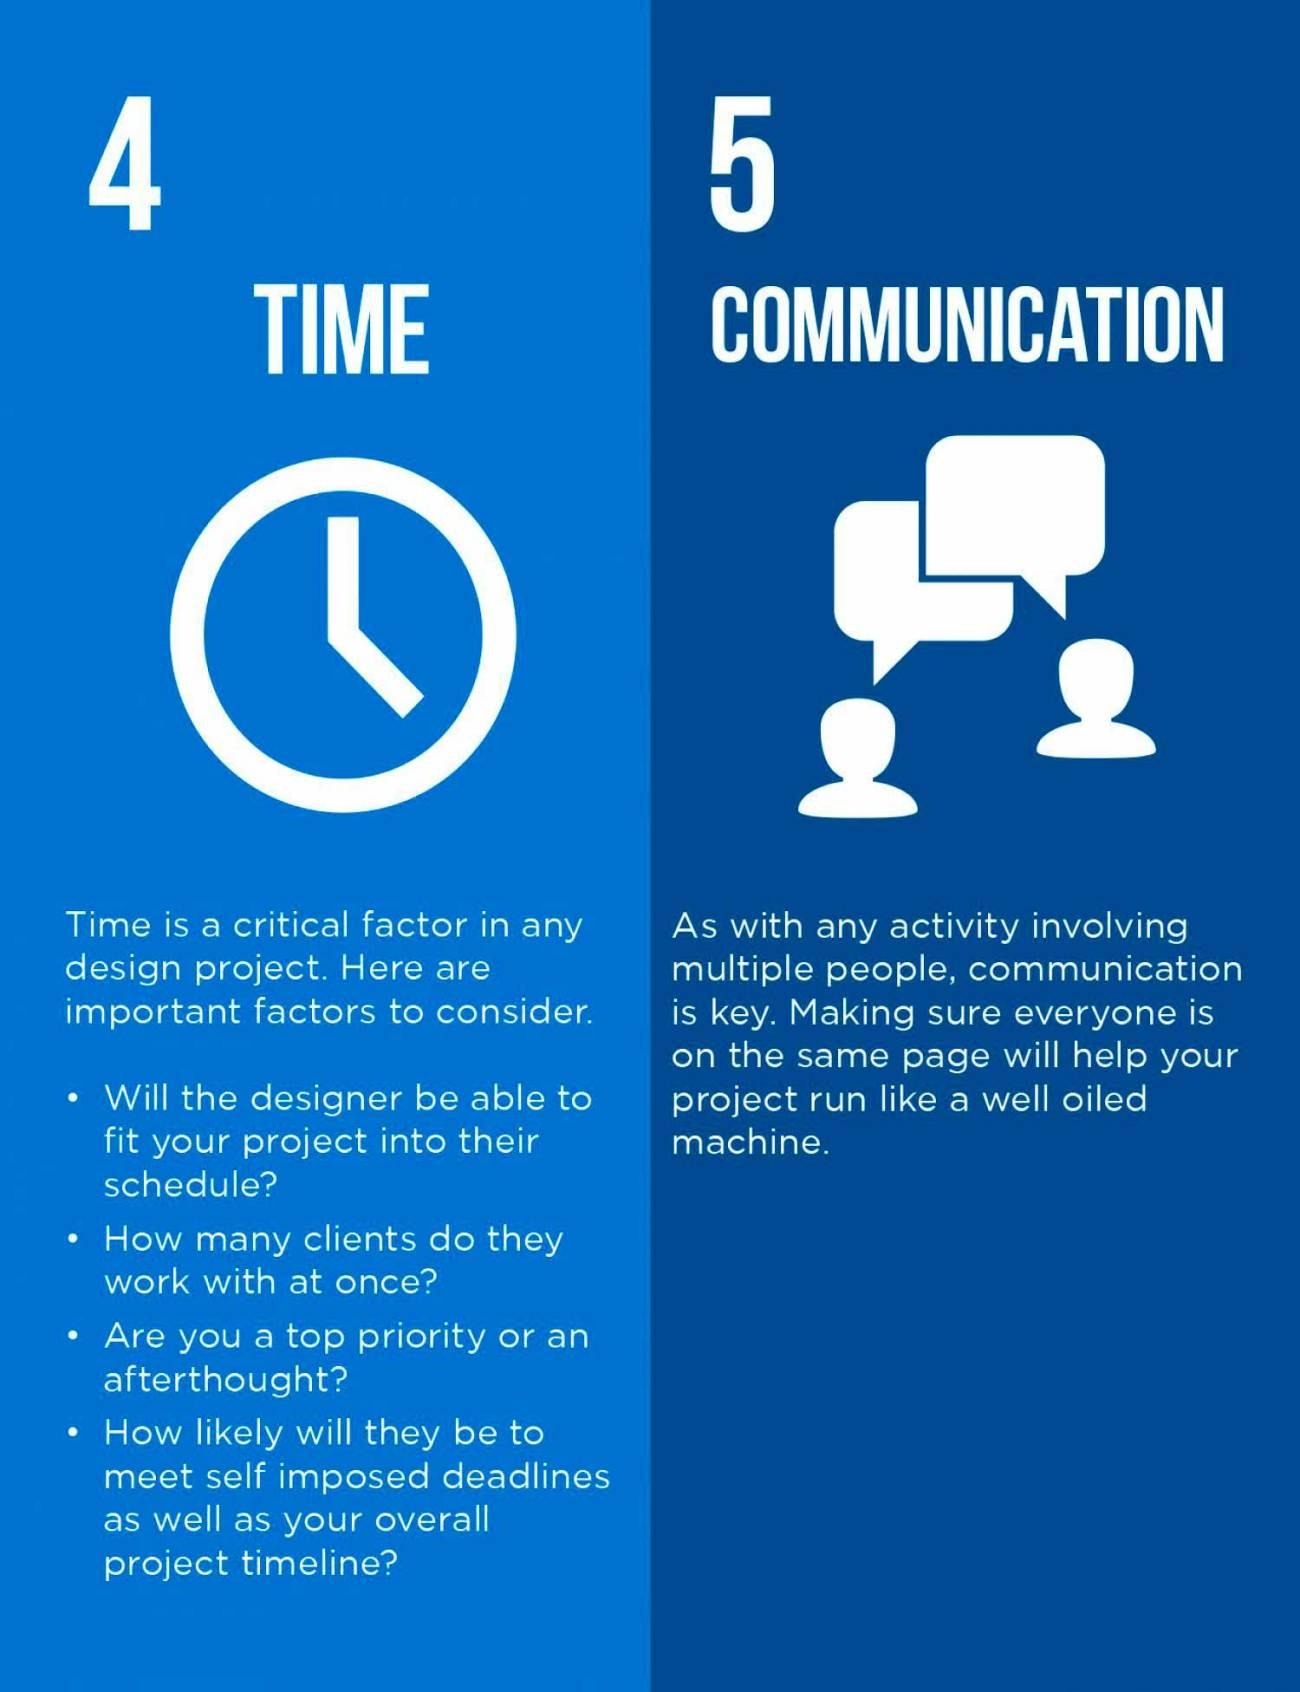 PixoLabo - Hiring a Web Designer - Time and Communication